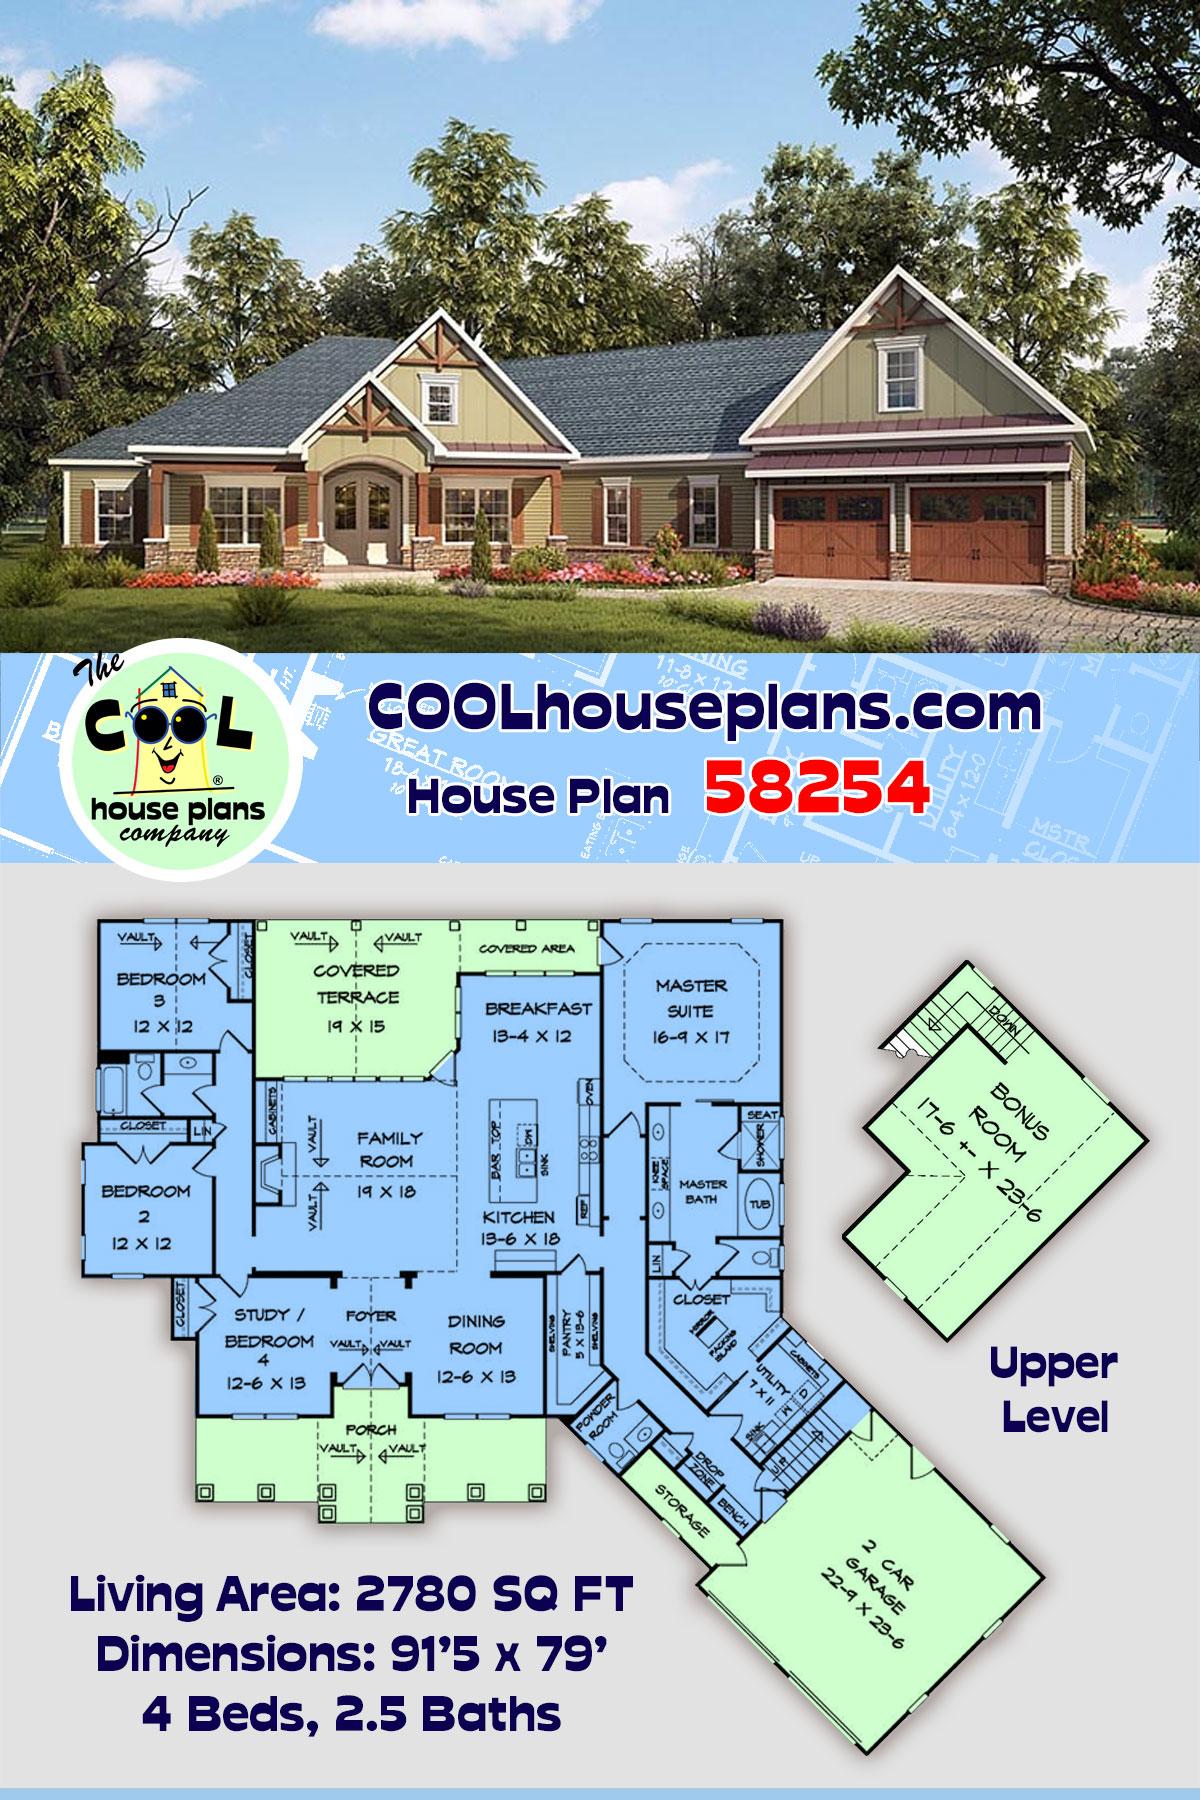 Craftsman House Plan 58254 with 4 Beds, 3 Baths, 2 Car Garage